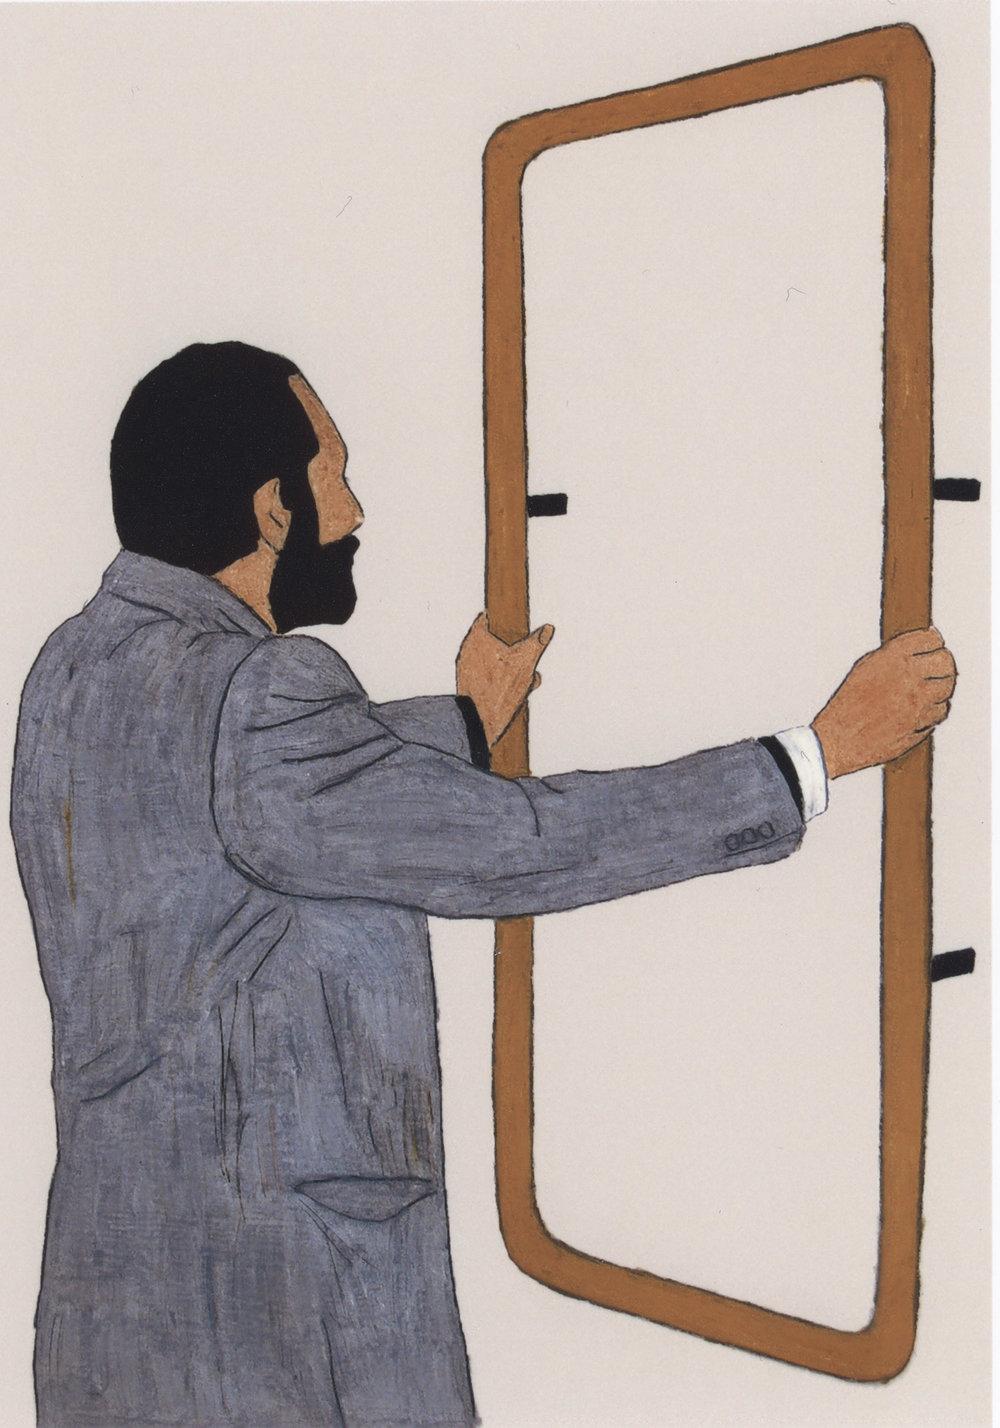 R. Zaugg | Wachskreide auf Karton | 2008 | 84 x 59 cm